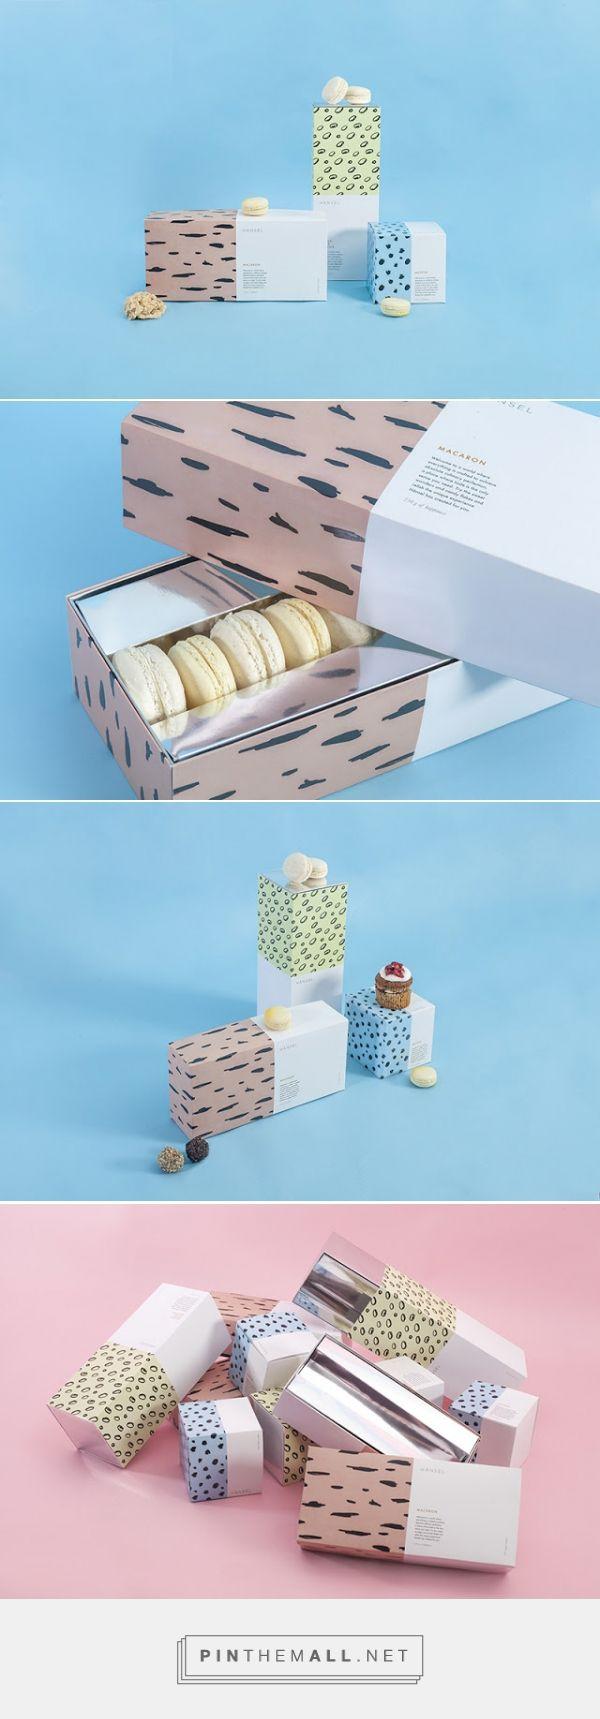 HÄNSEL #Pastry #packaging designed by CHAPTER - http://www.packagingoftheworld.com/2015/05/hansel.html